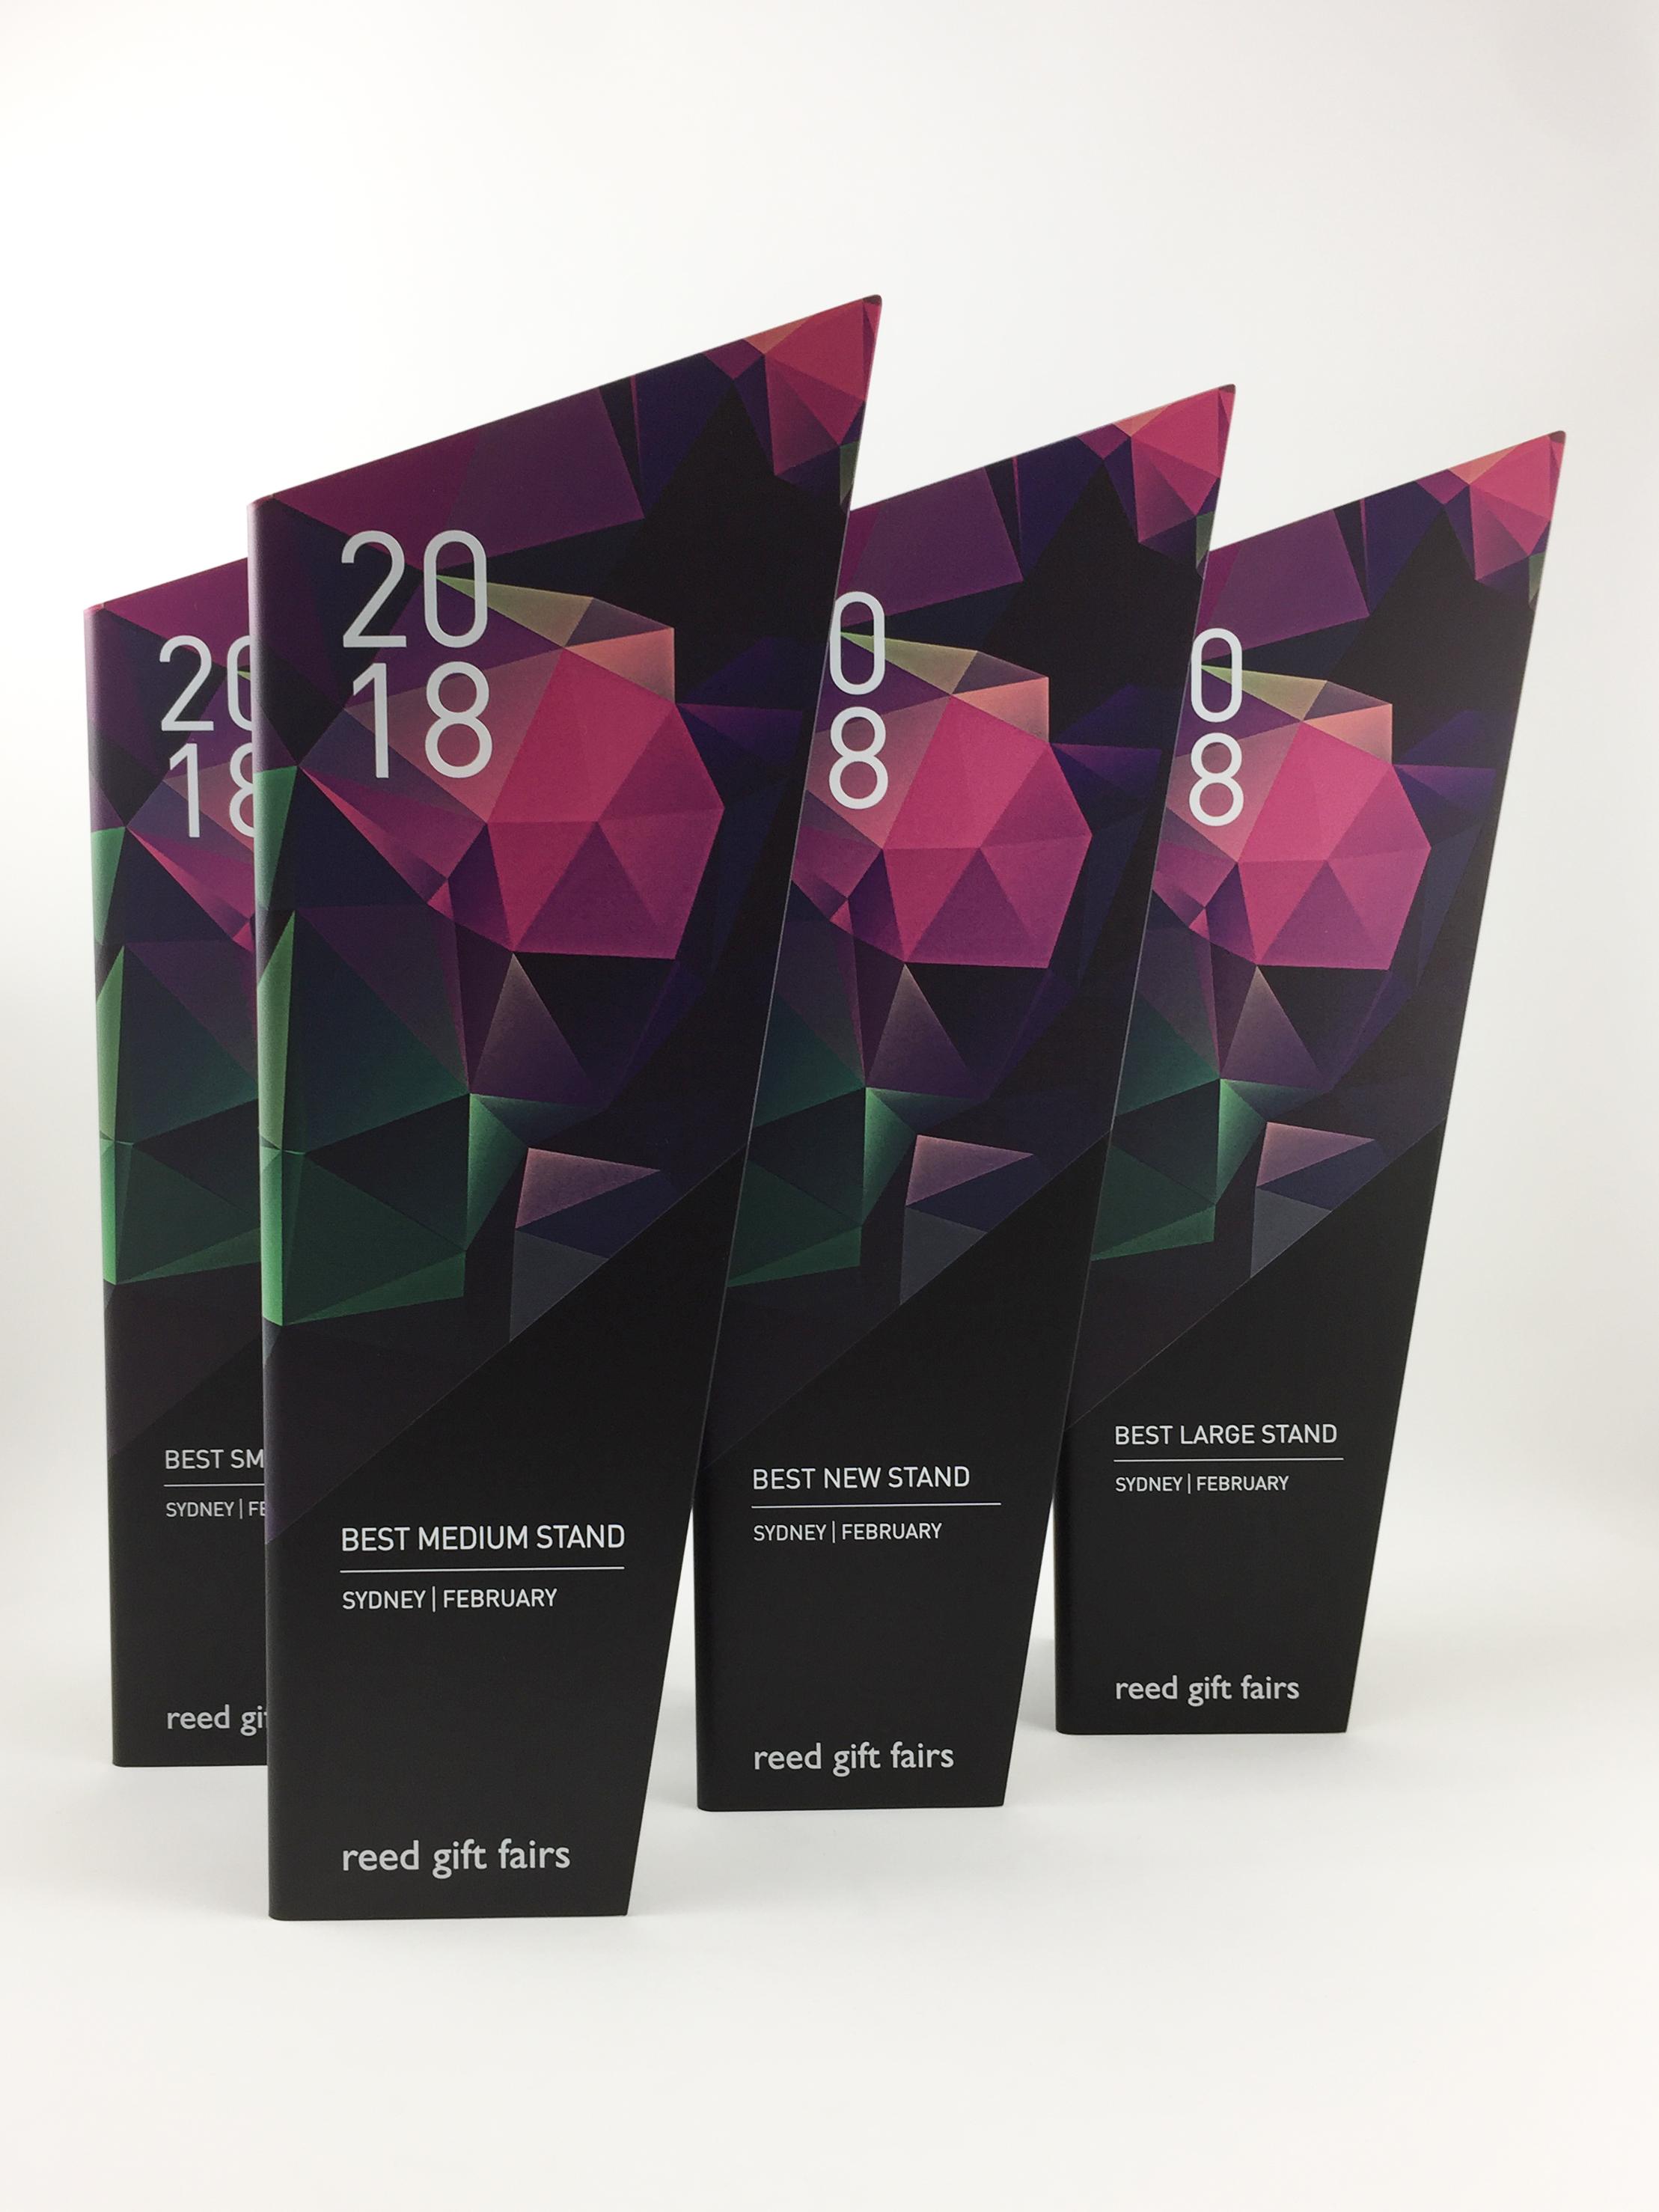 reed-gift-fairs-graphic-print-aluminium-trophy-award-01.jpg